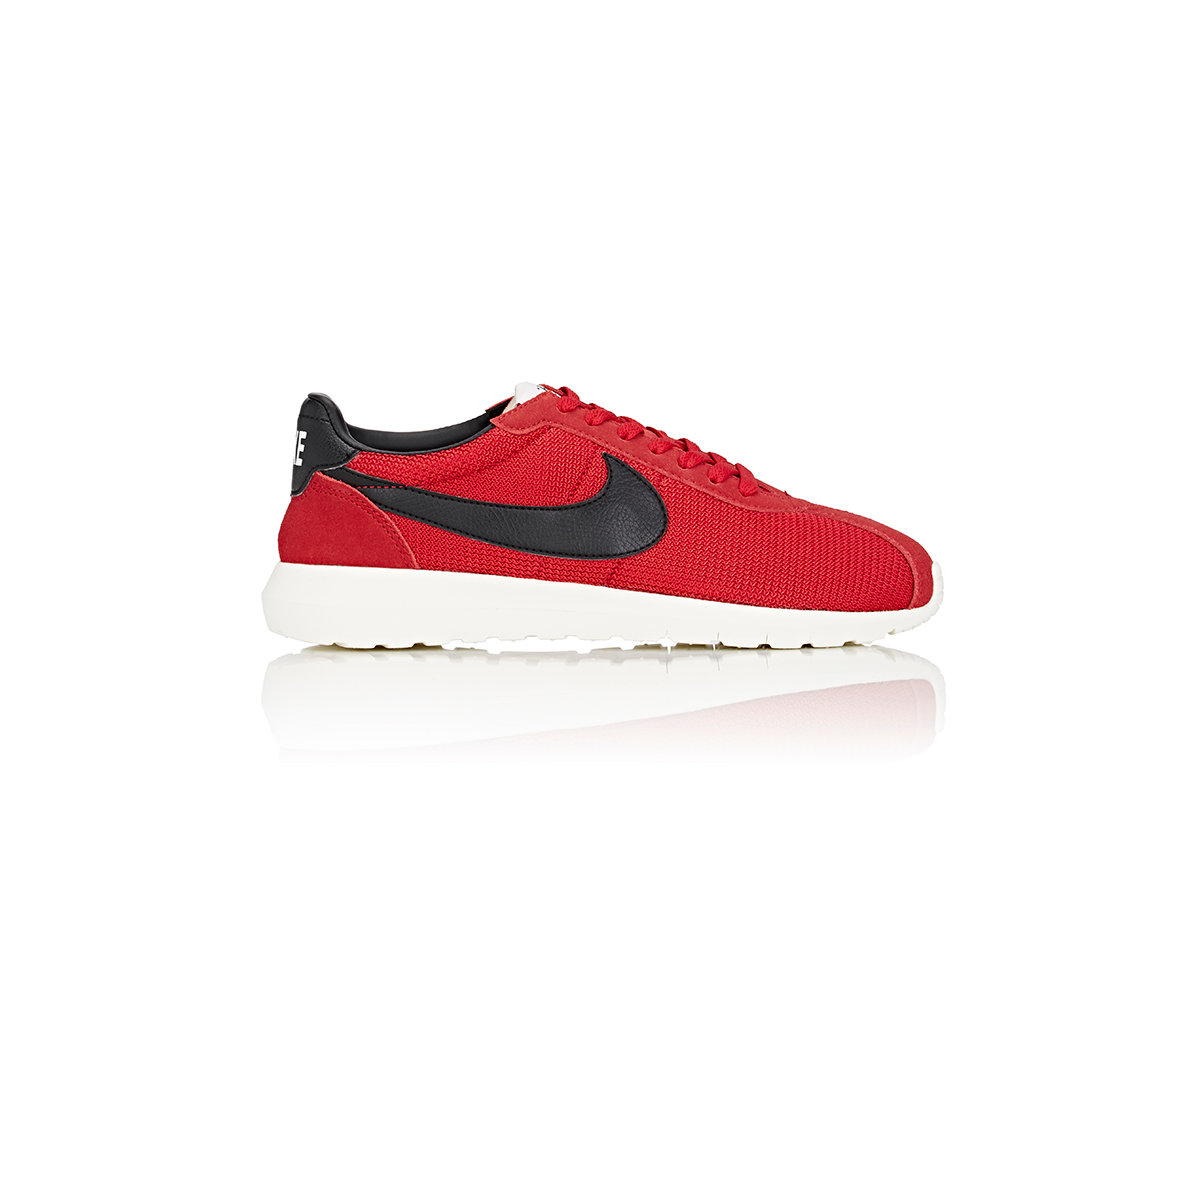 nike roshe ld 1000 sneakers in red for men lyst. Black Bedroom Furniture Sets. Home Design Ideas